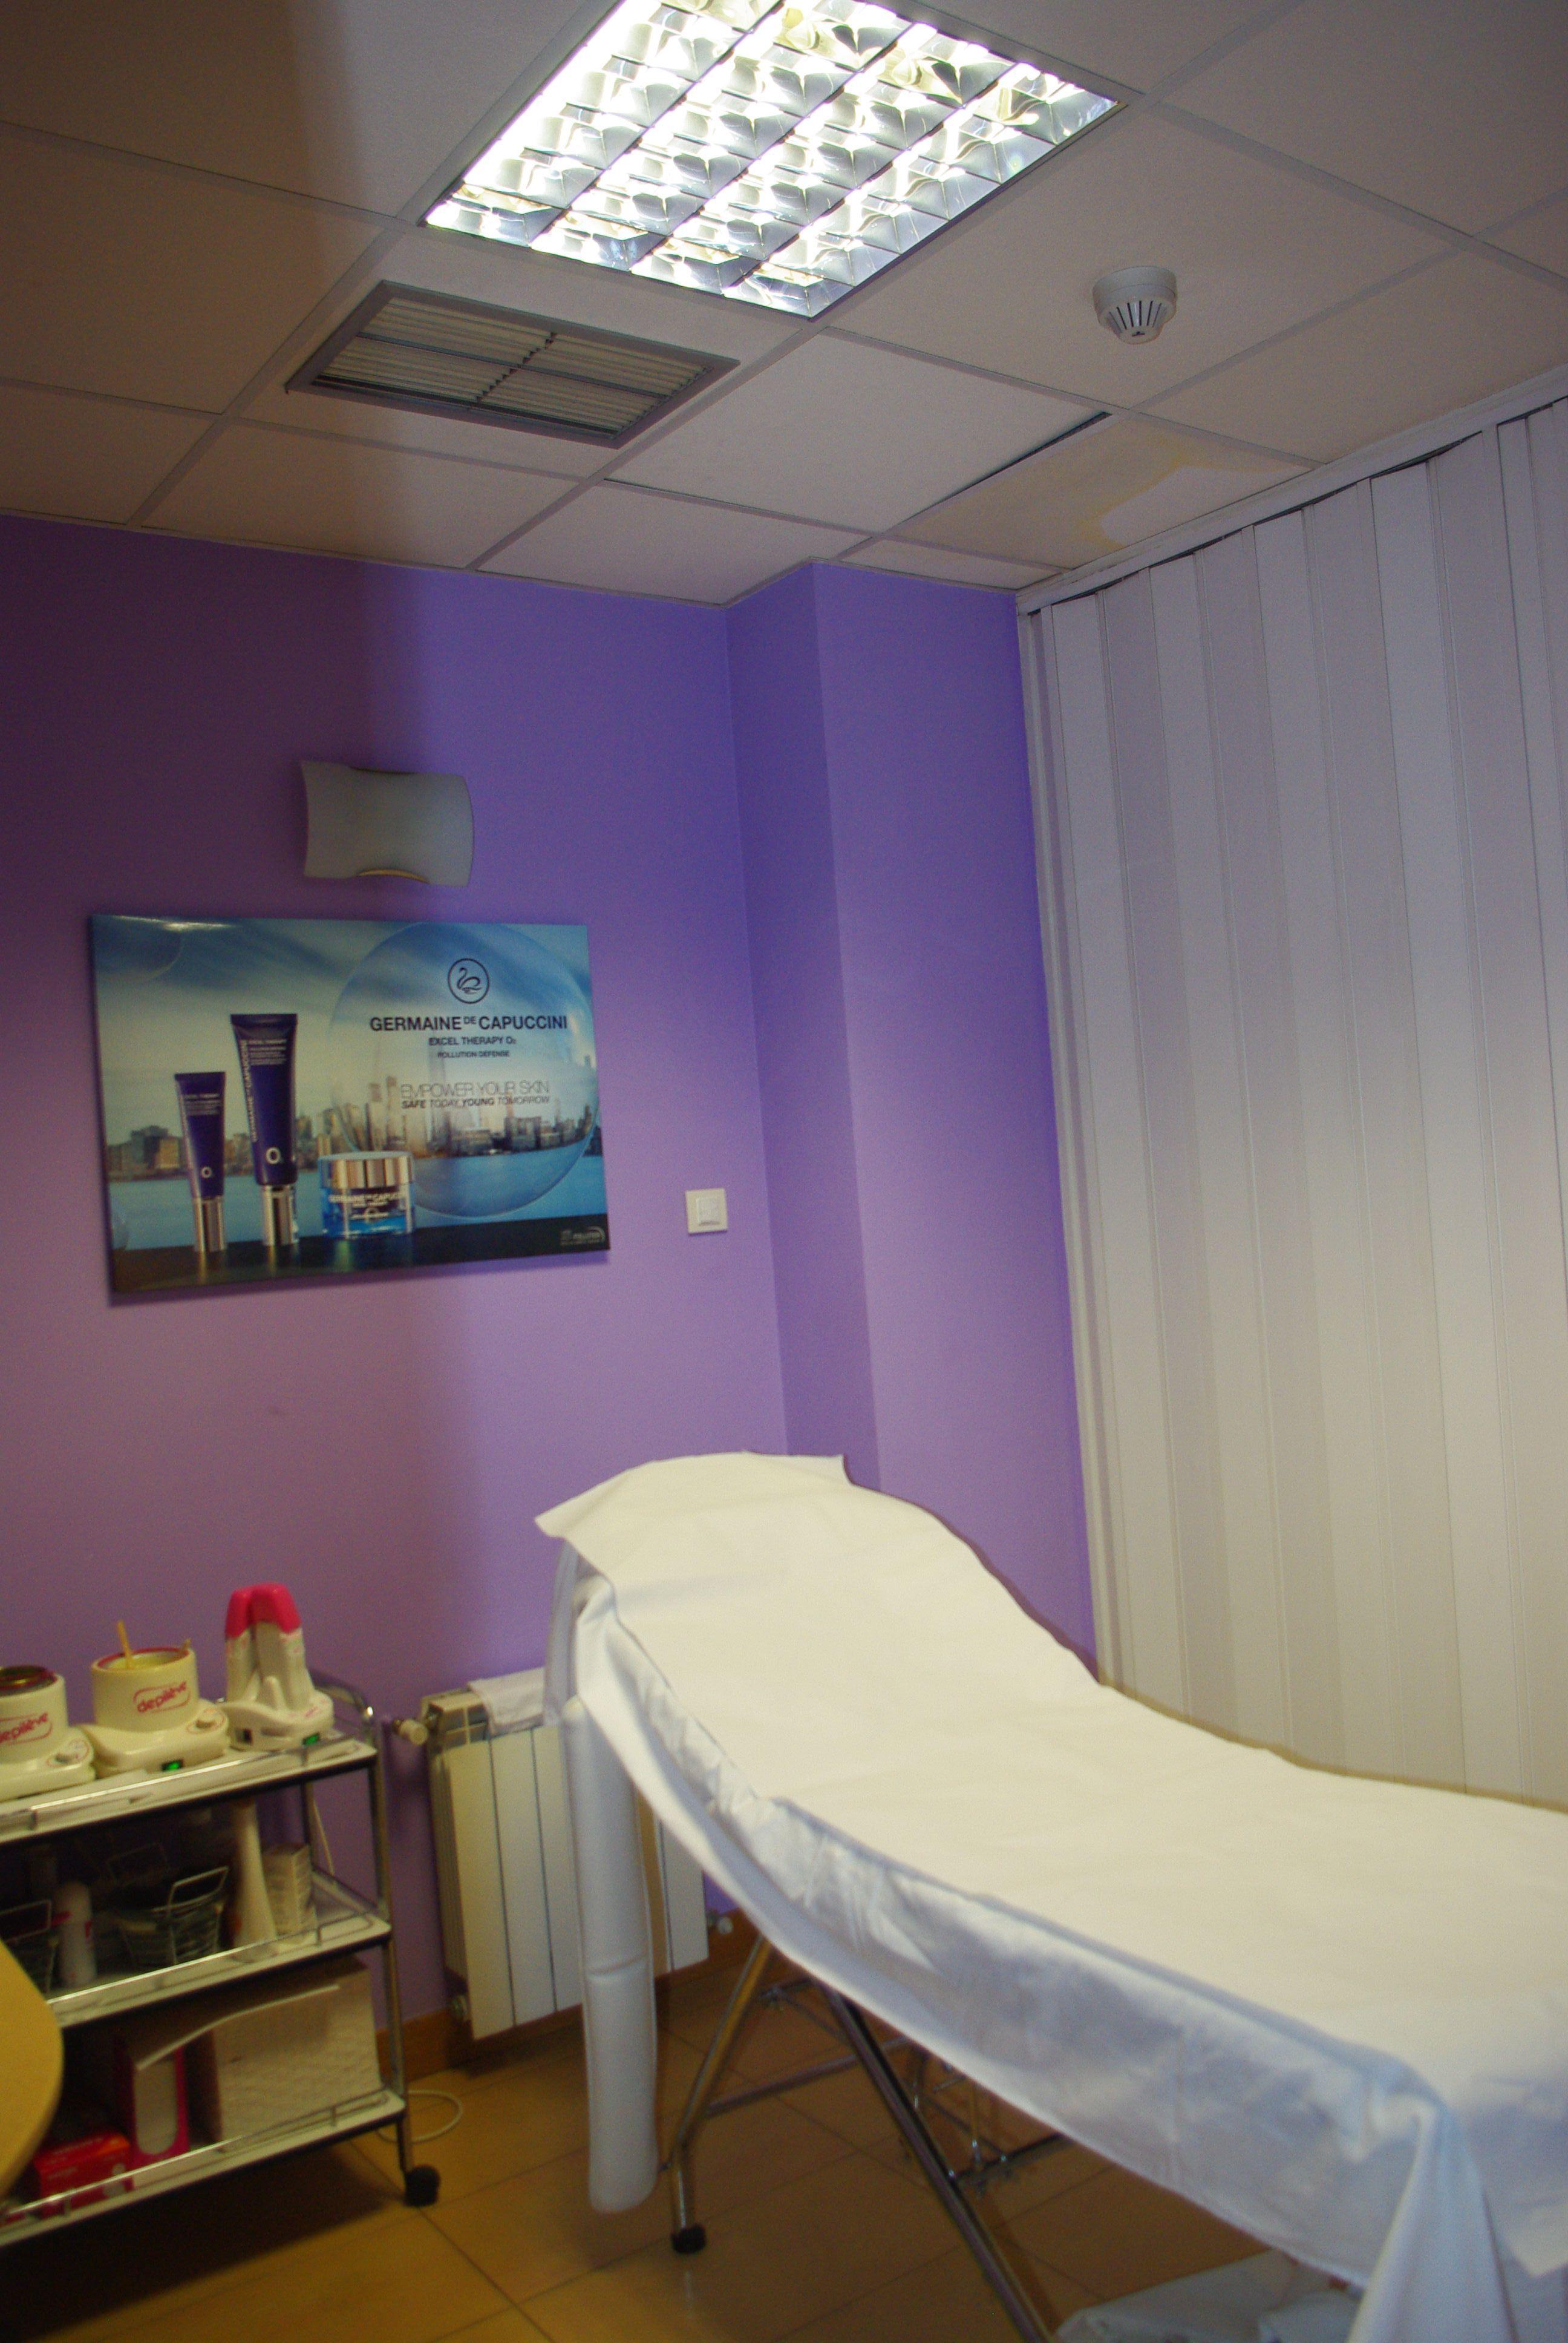 Centro de masajes en Pamplona